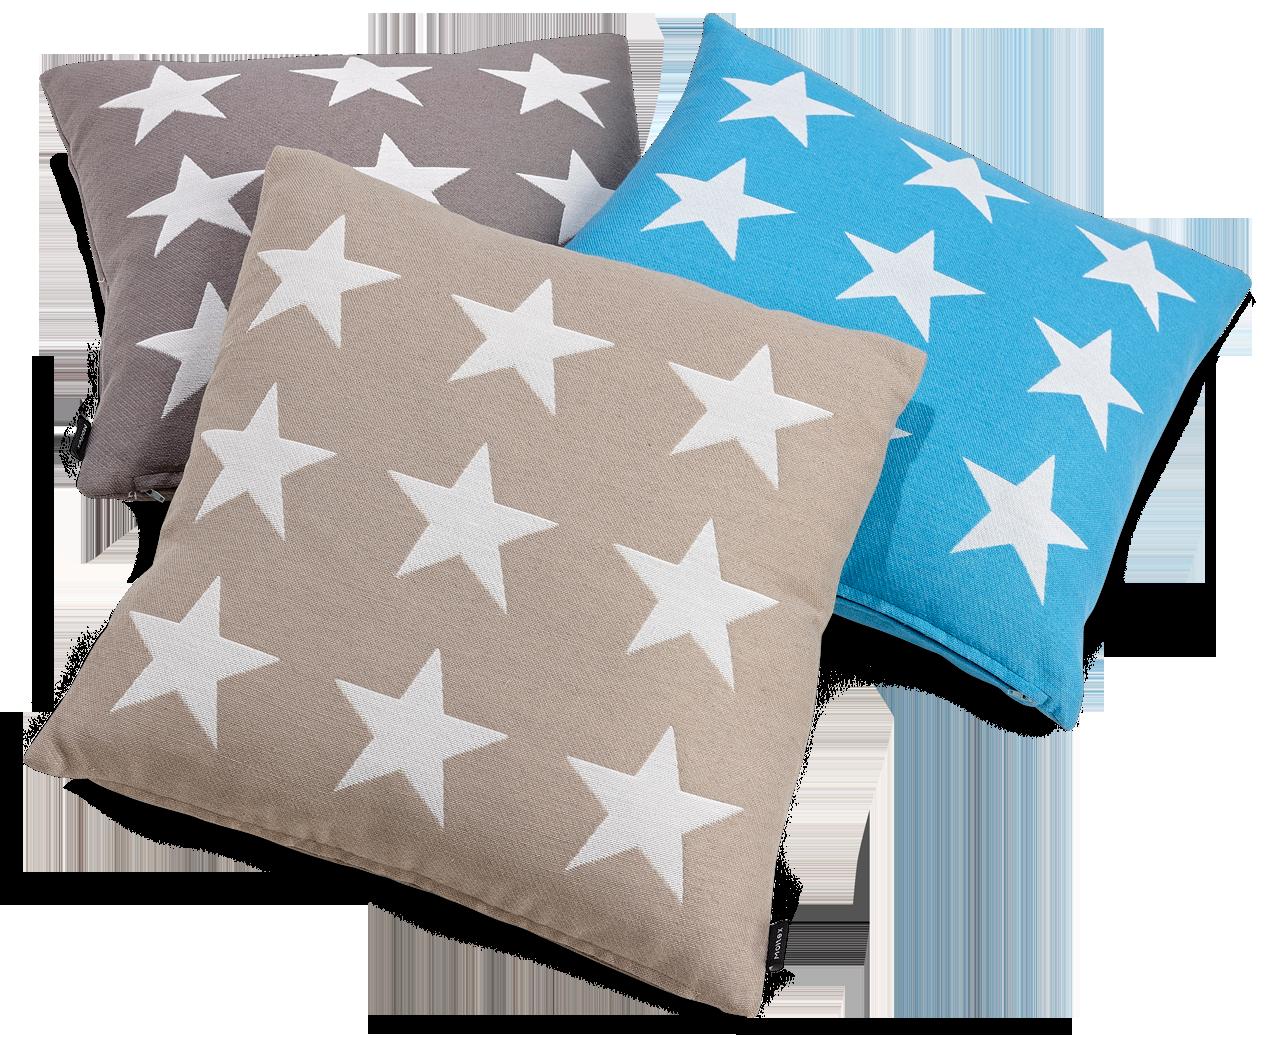 Asko Multistar pillows <3